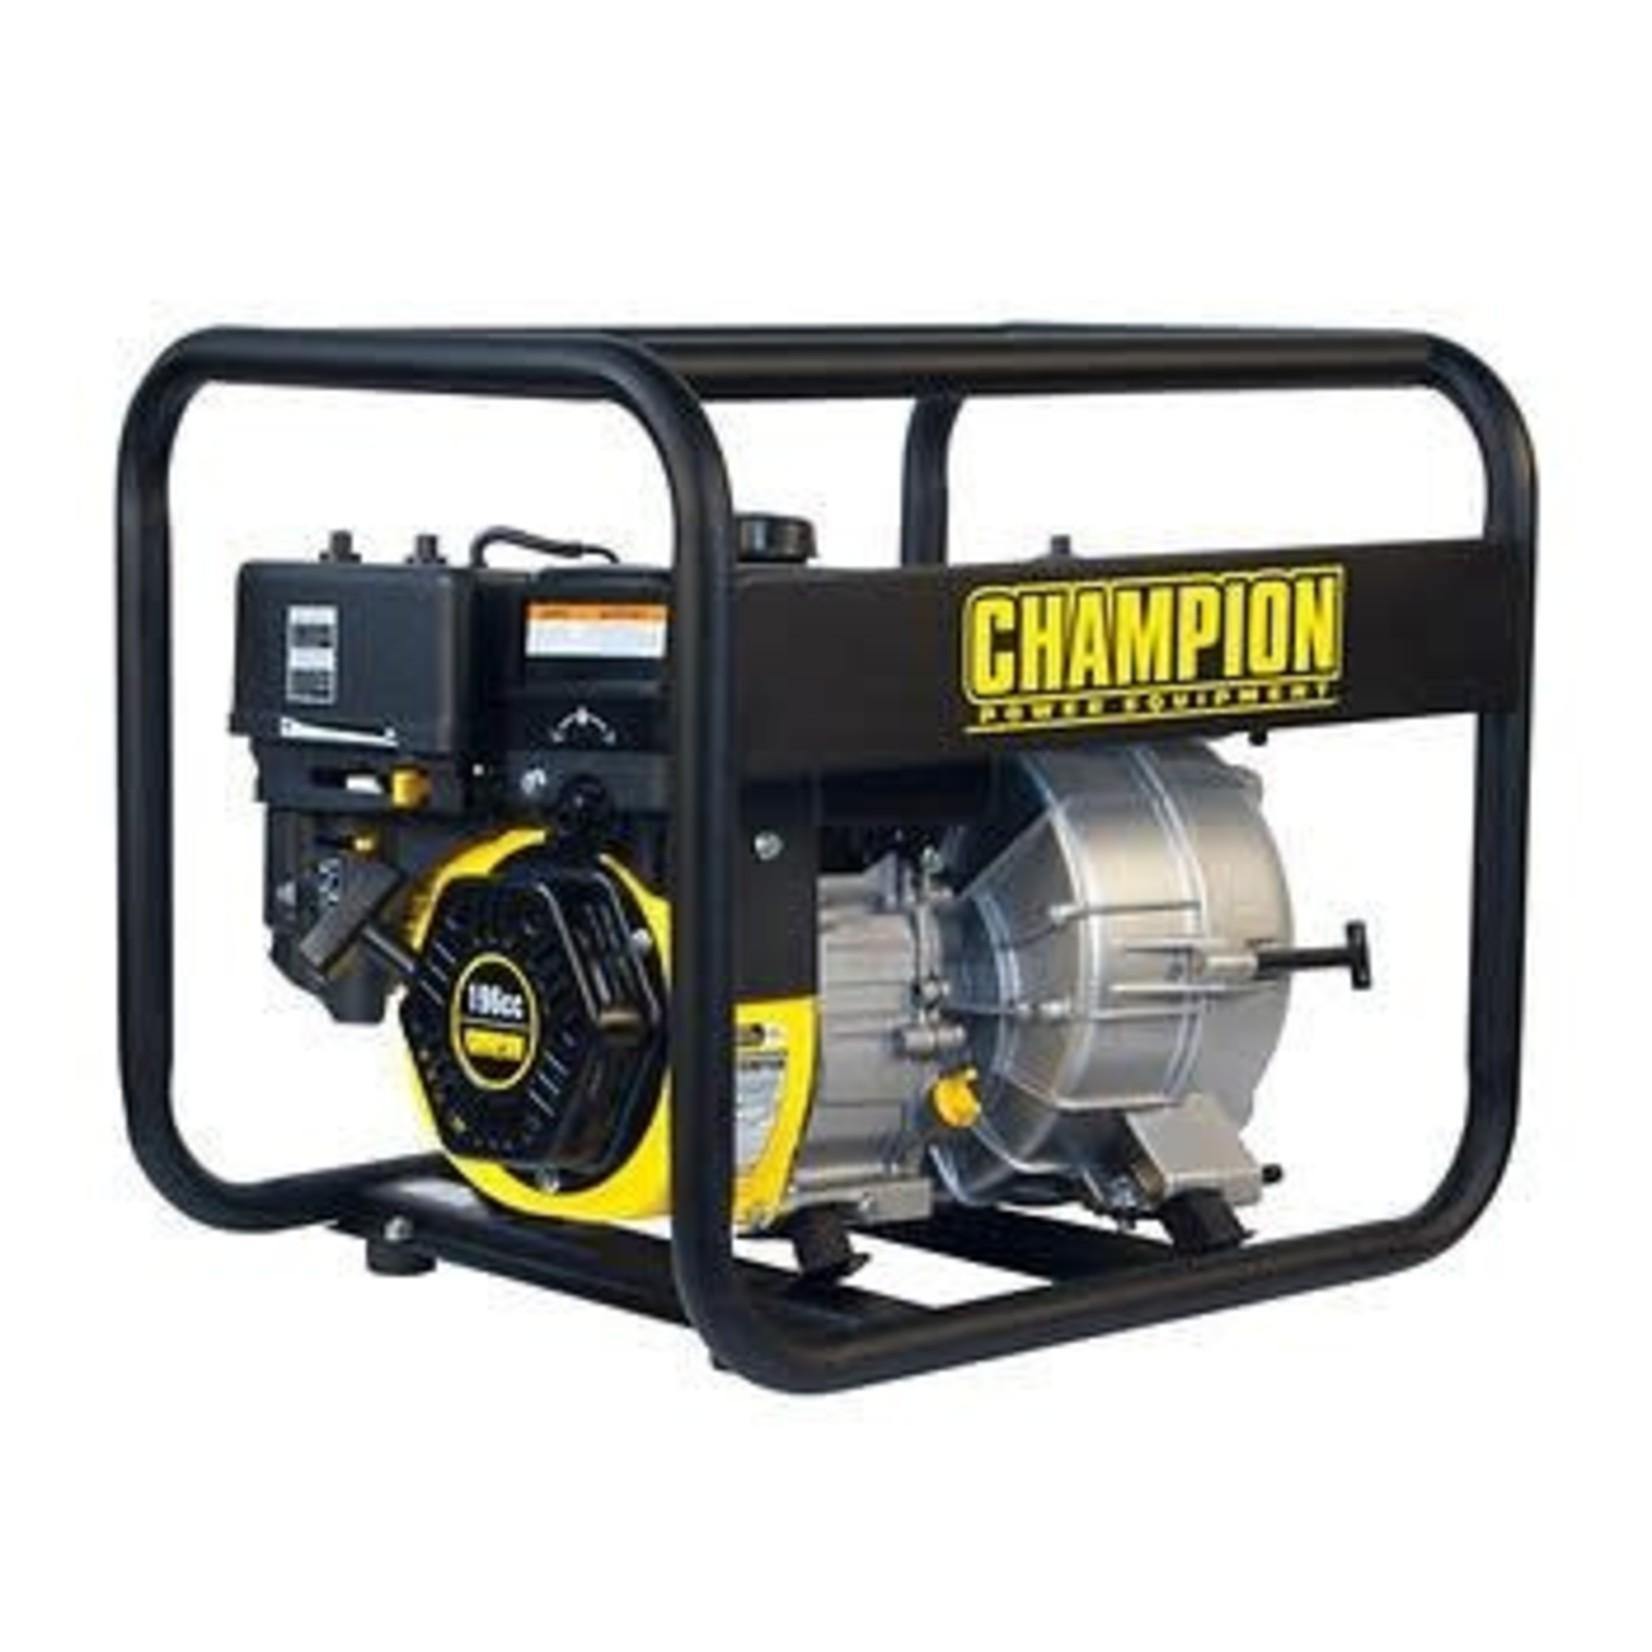 Champion 3-in. Gas-powered Semi-trash Water Transfer Pump